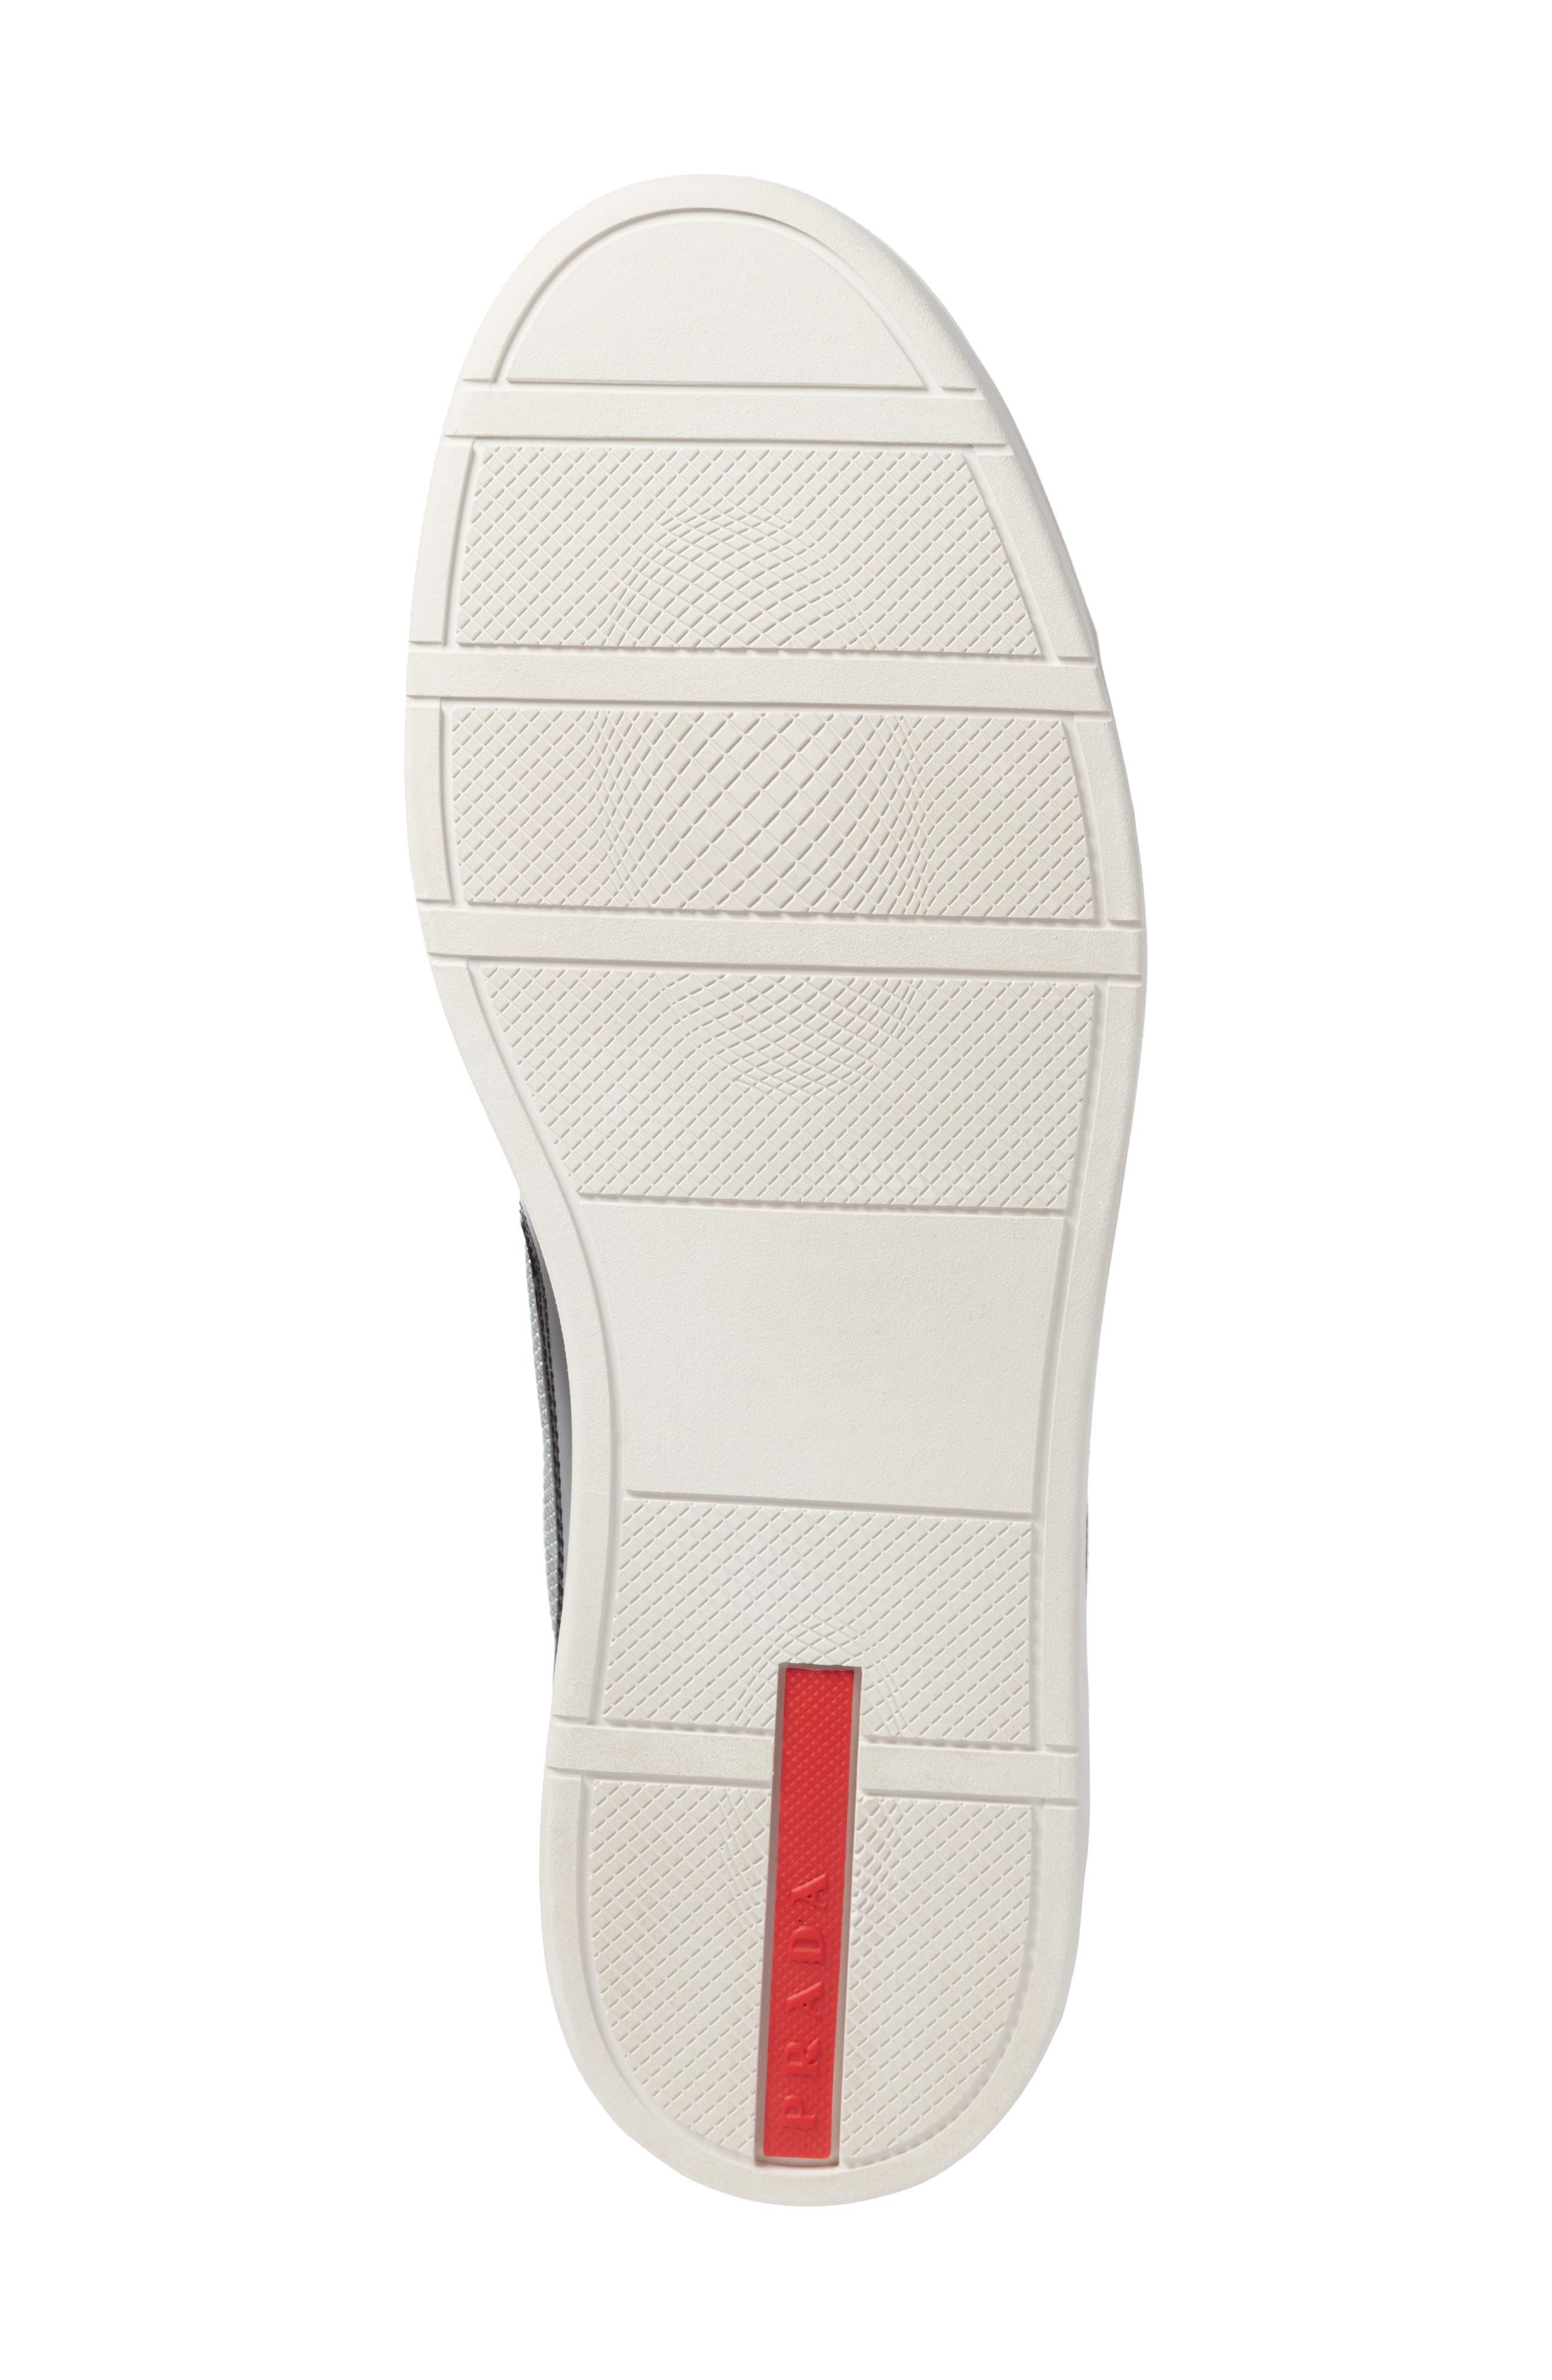 Linea Rossa New America's Cup Sneaker,                             Alternate thumbnail 6, color,                             Nero Argento